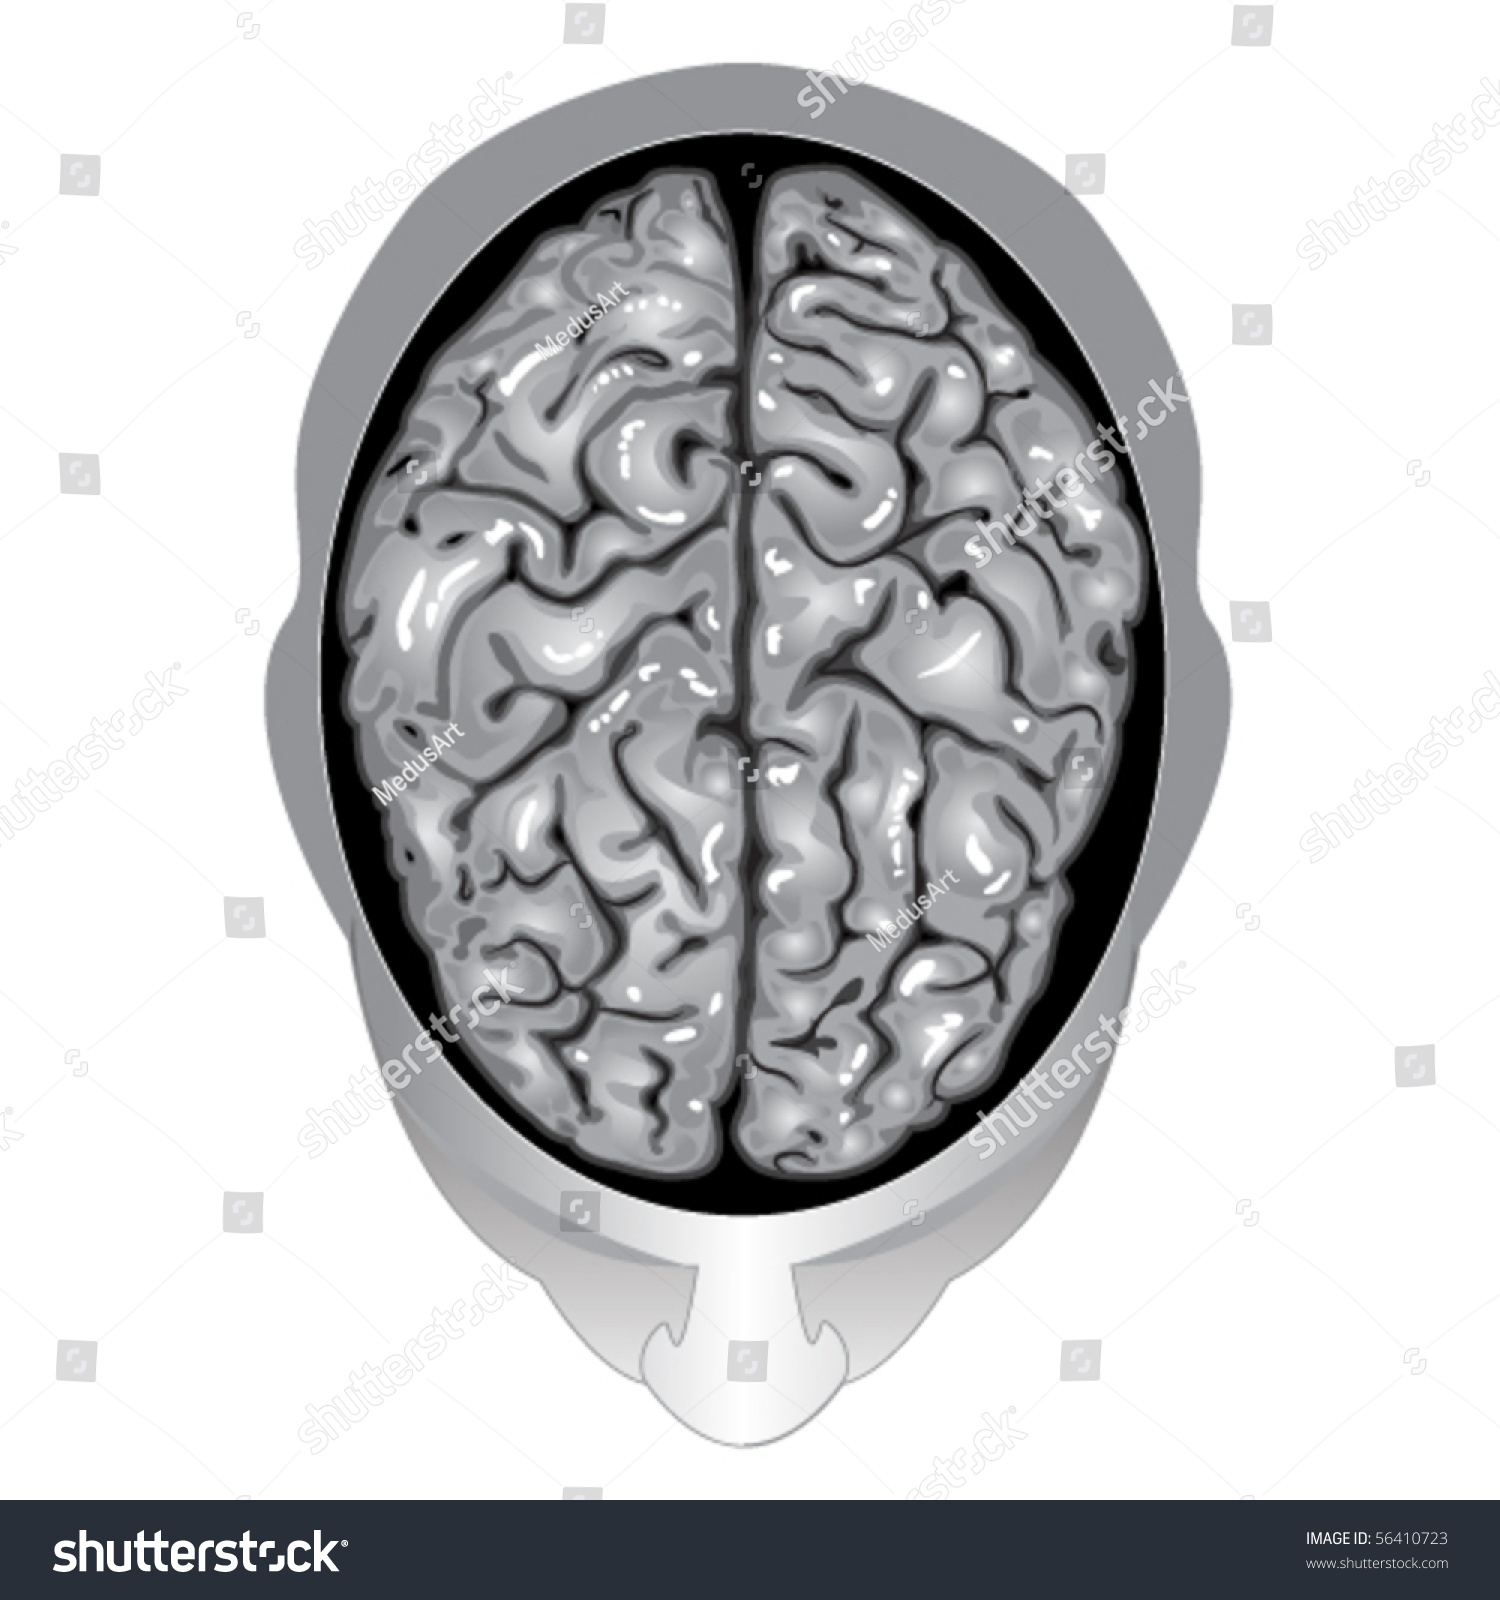 brain top view vector - photo #10